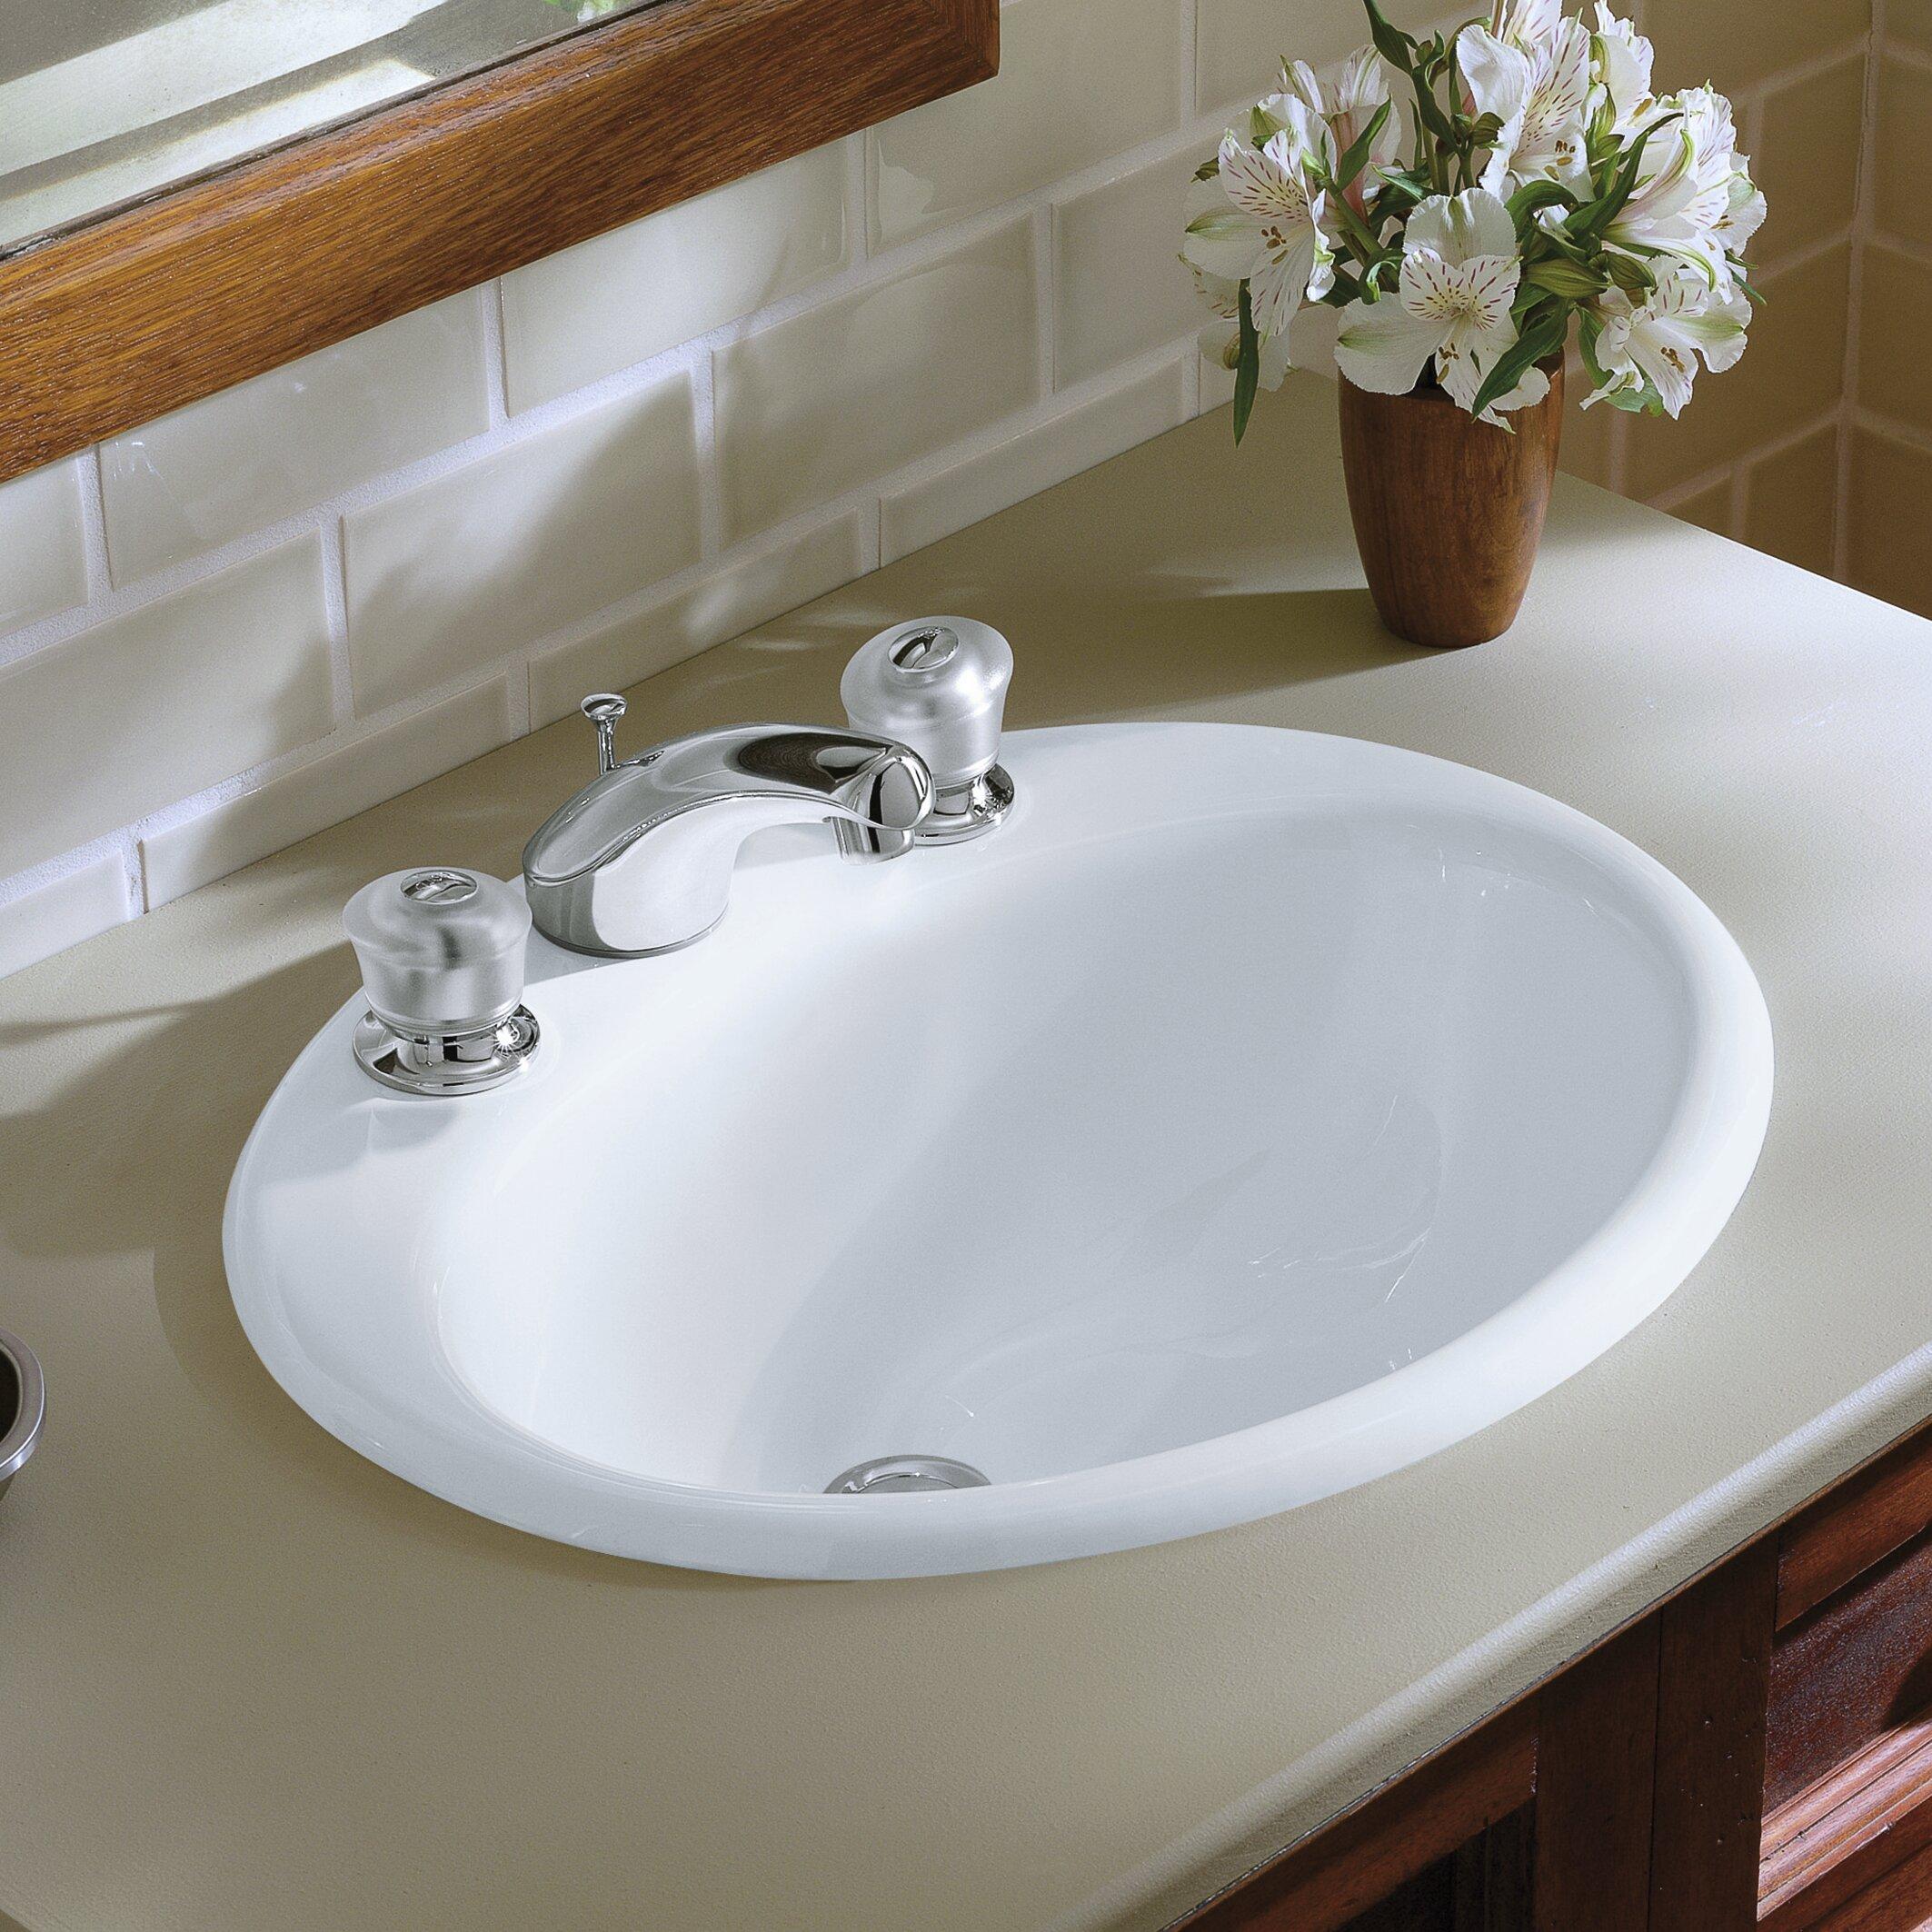 Wondrous Kohler Farmington Metal Oval Drop In Bathroom Sink With Home Interior And Landscaping Palasignezvosmurscom